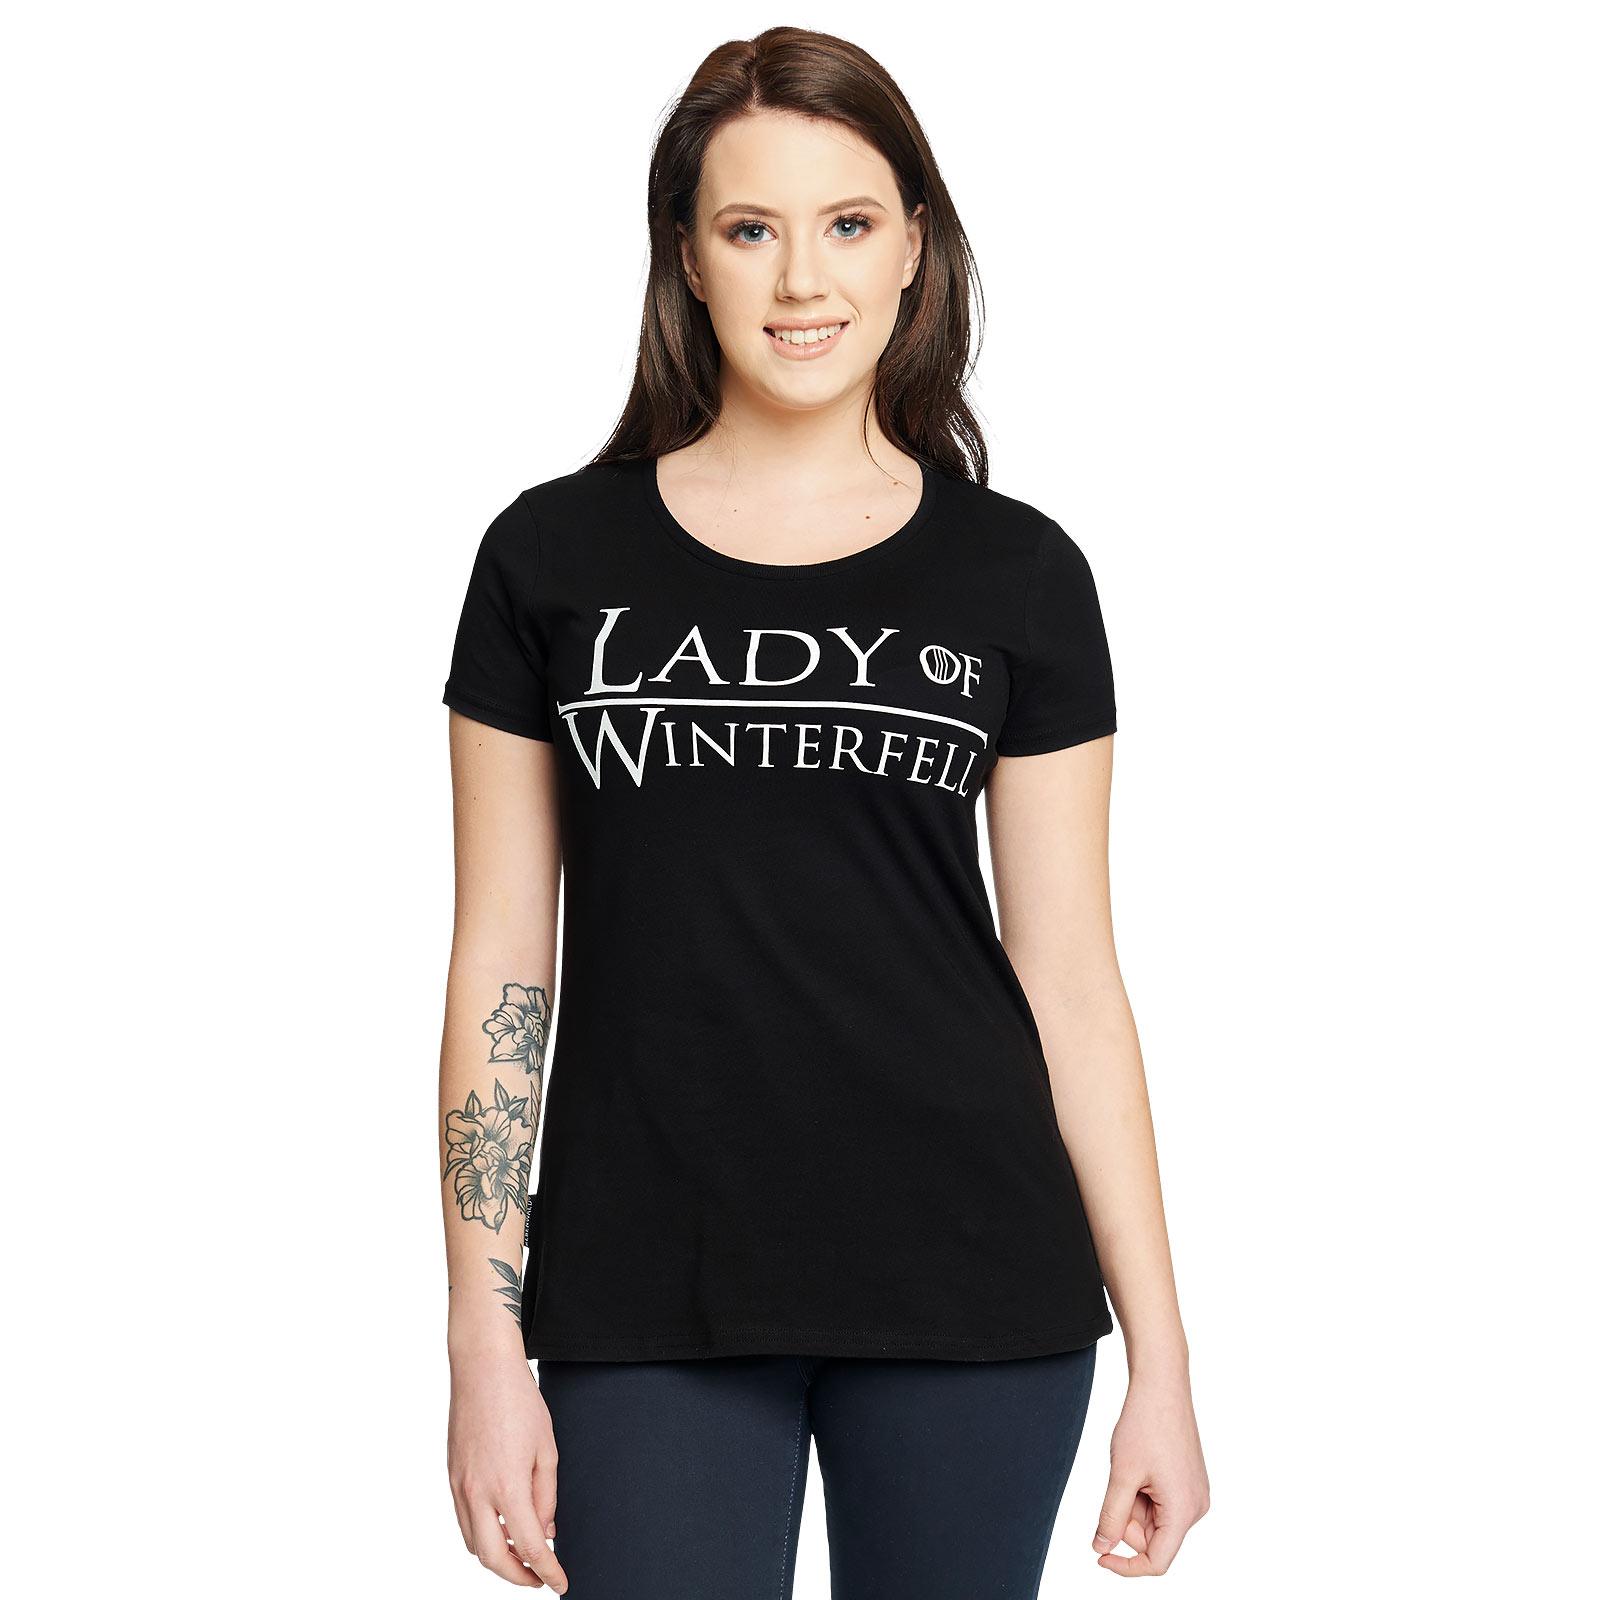 Lady of Winterfell Damen T-Shirt für Game of Thrones Fans